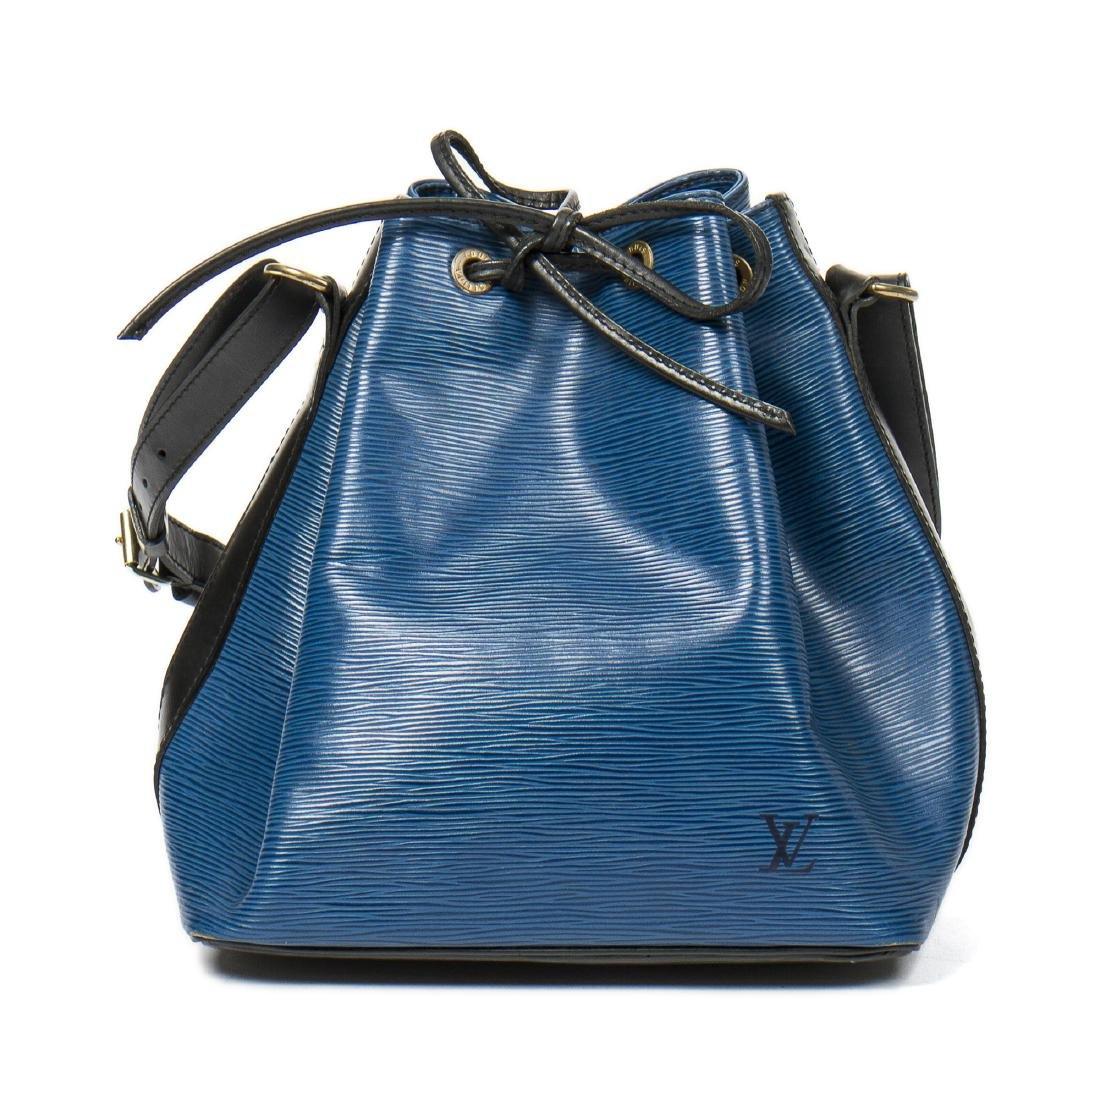 Louis Vuitton Noe Bicolor